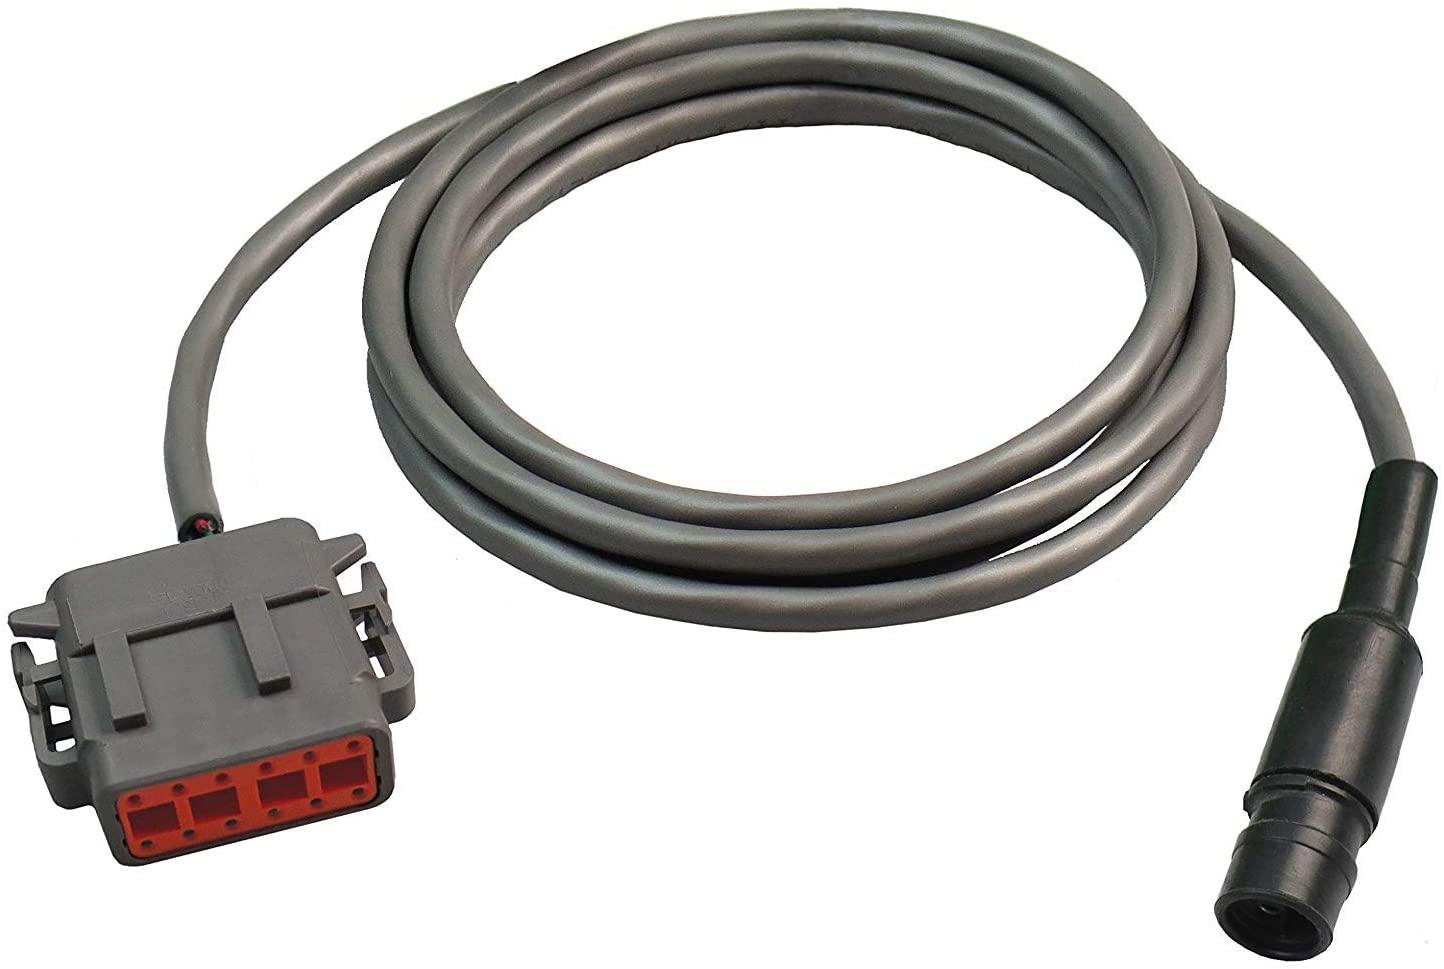 Sensor-1 A-ADTM06-H, Black